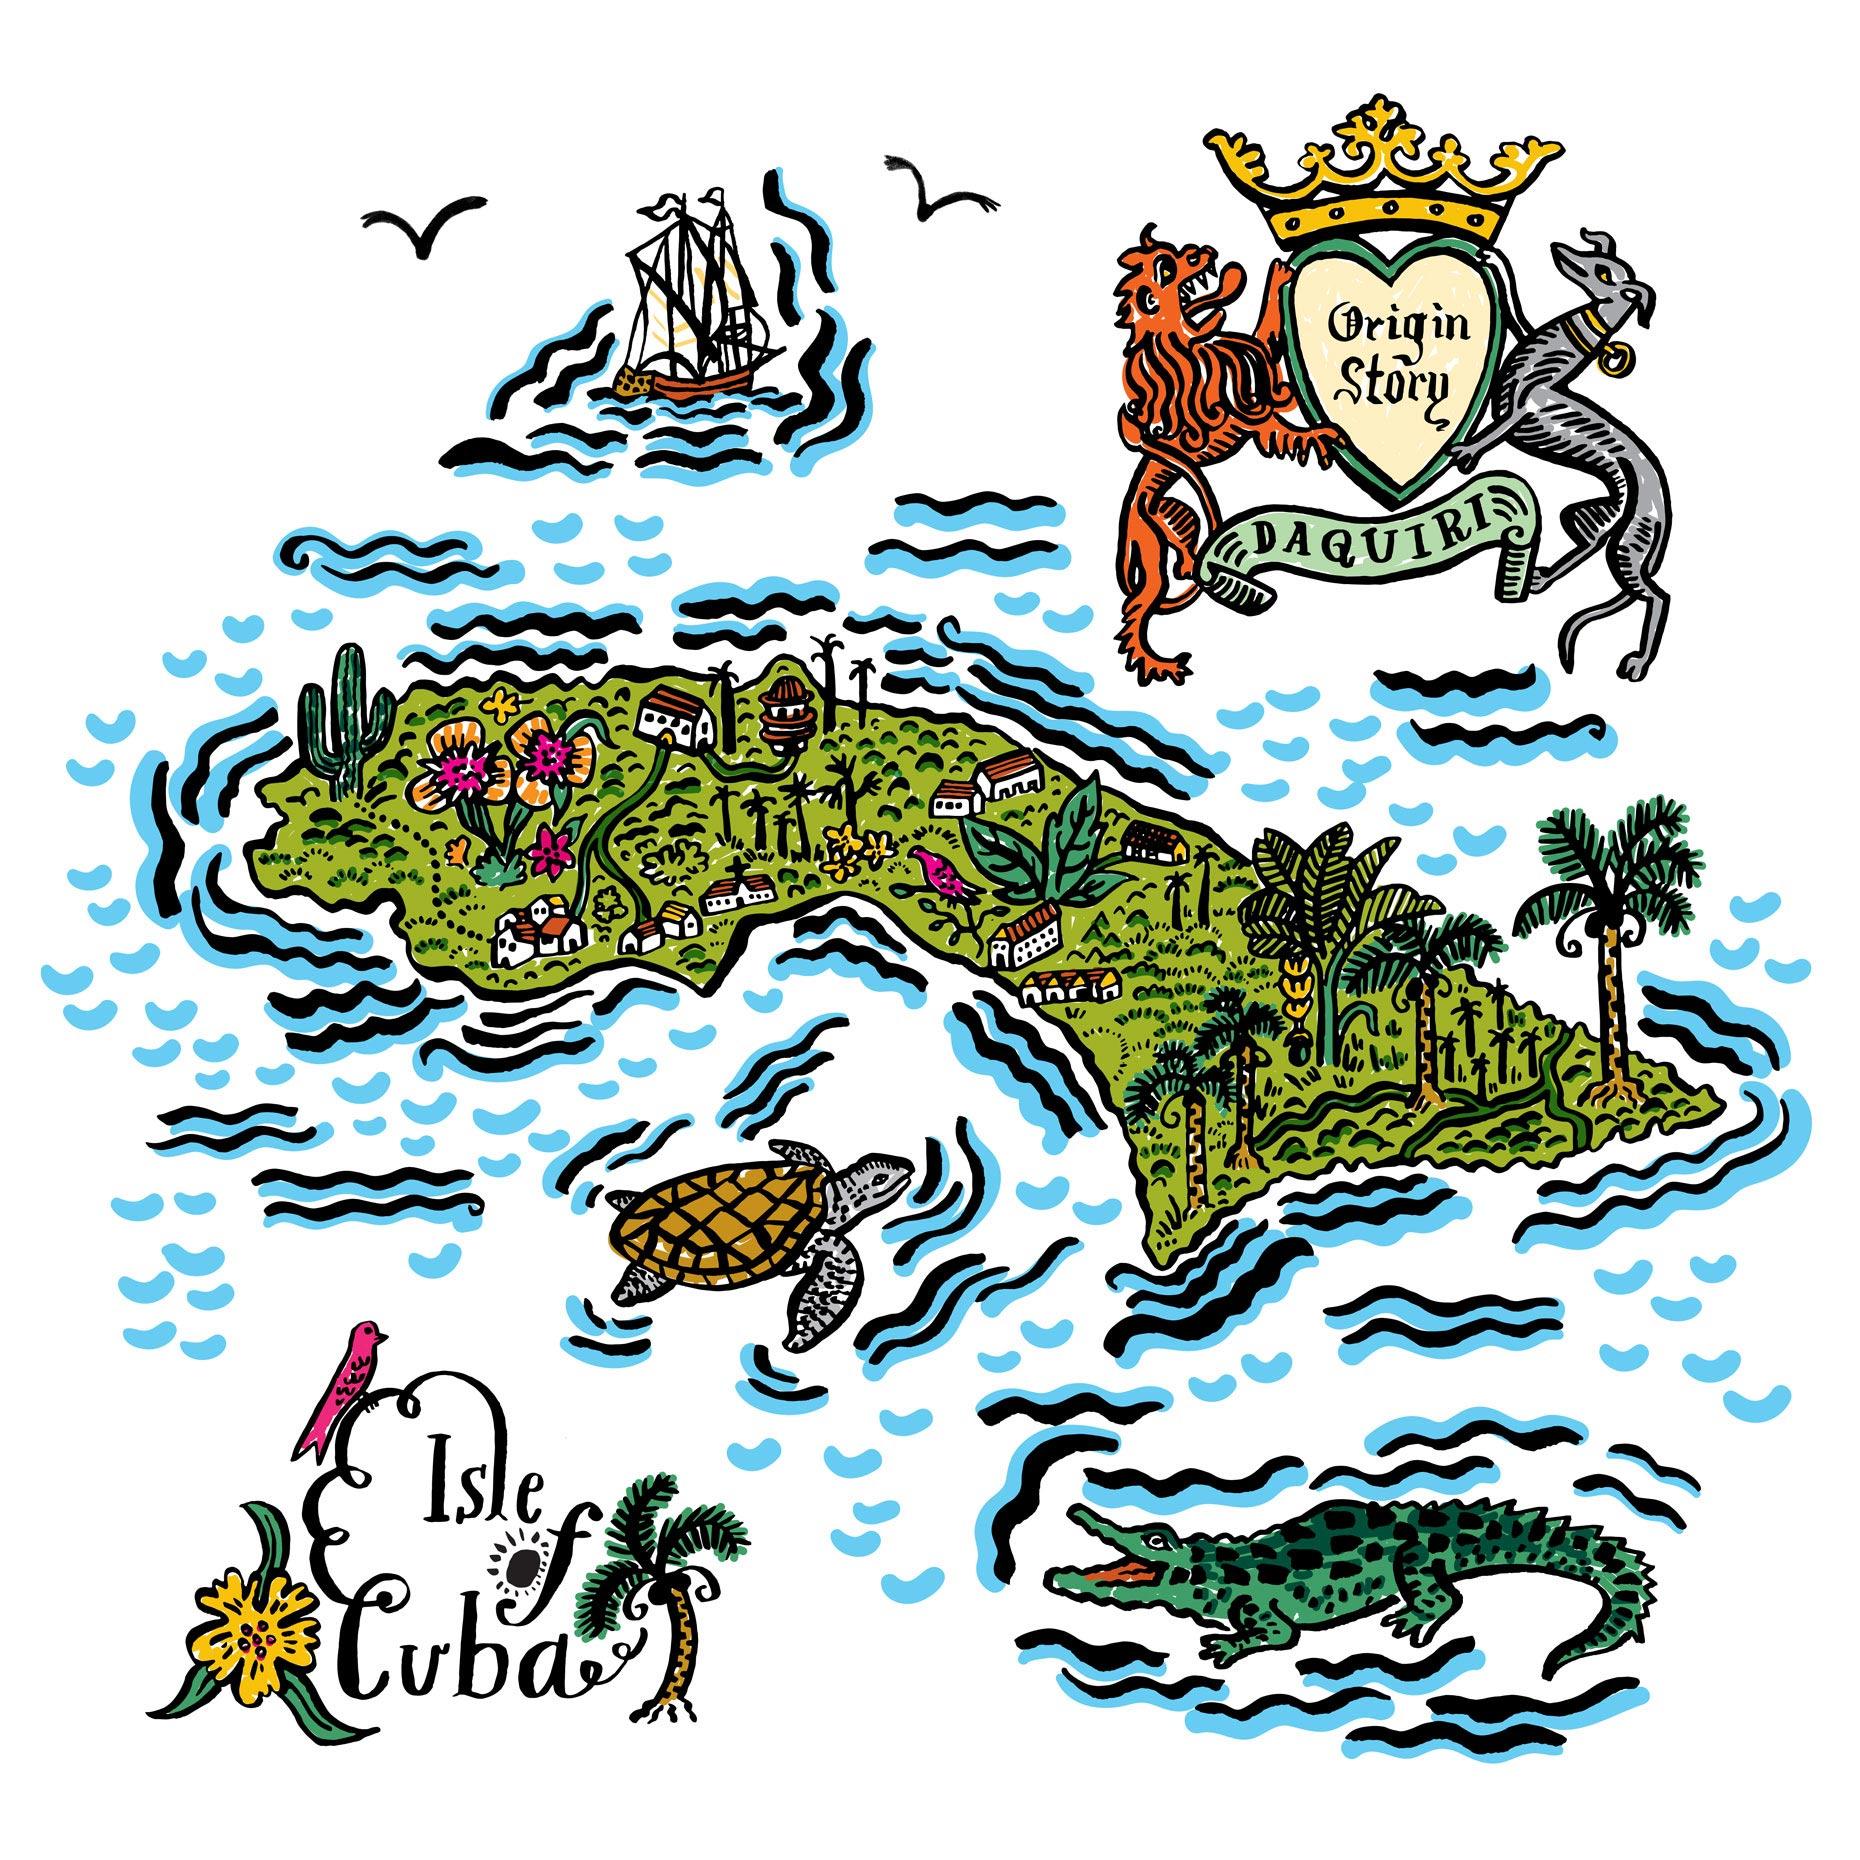 daquiri_cuba_map.jpg